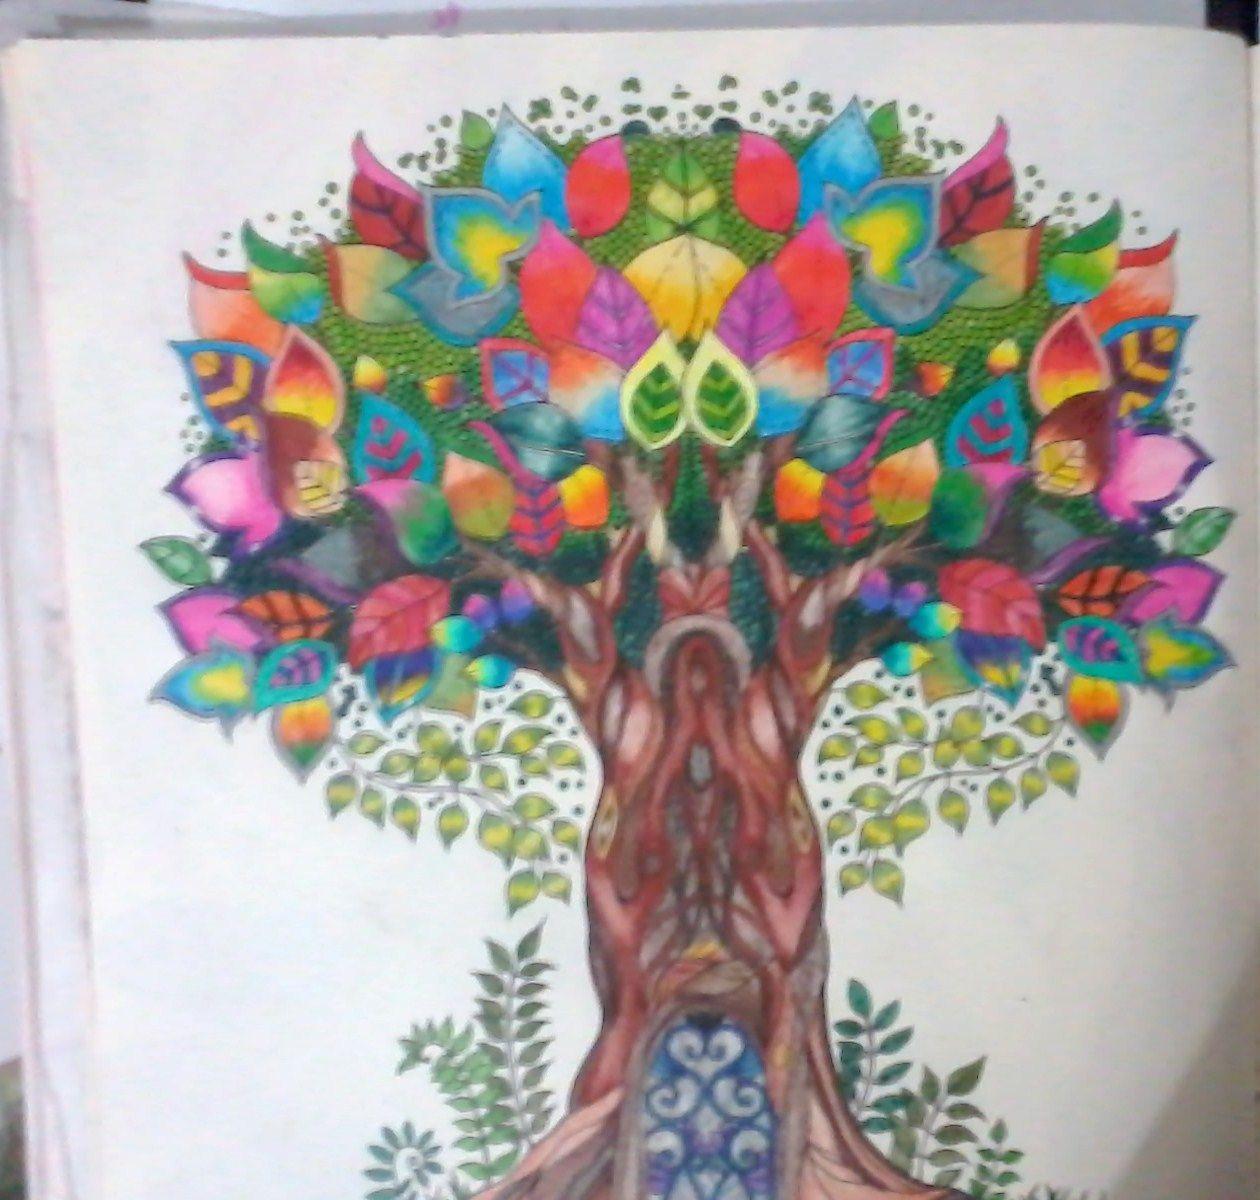 Zendoodle coloring enchanting gardens -  Rvore Johanna Basford Enchanted Forest Secret Garden Floresta Encantada Jardim Secreto